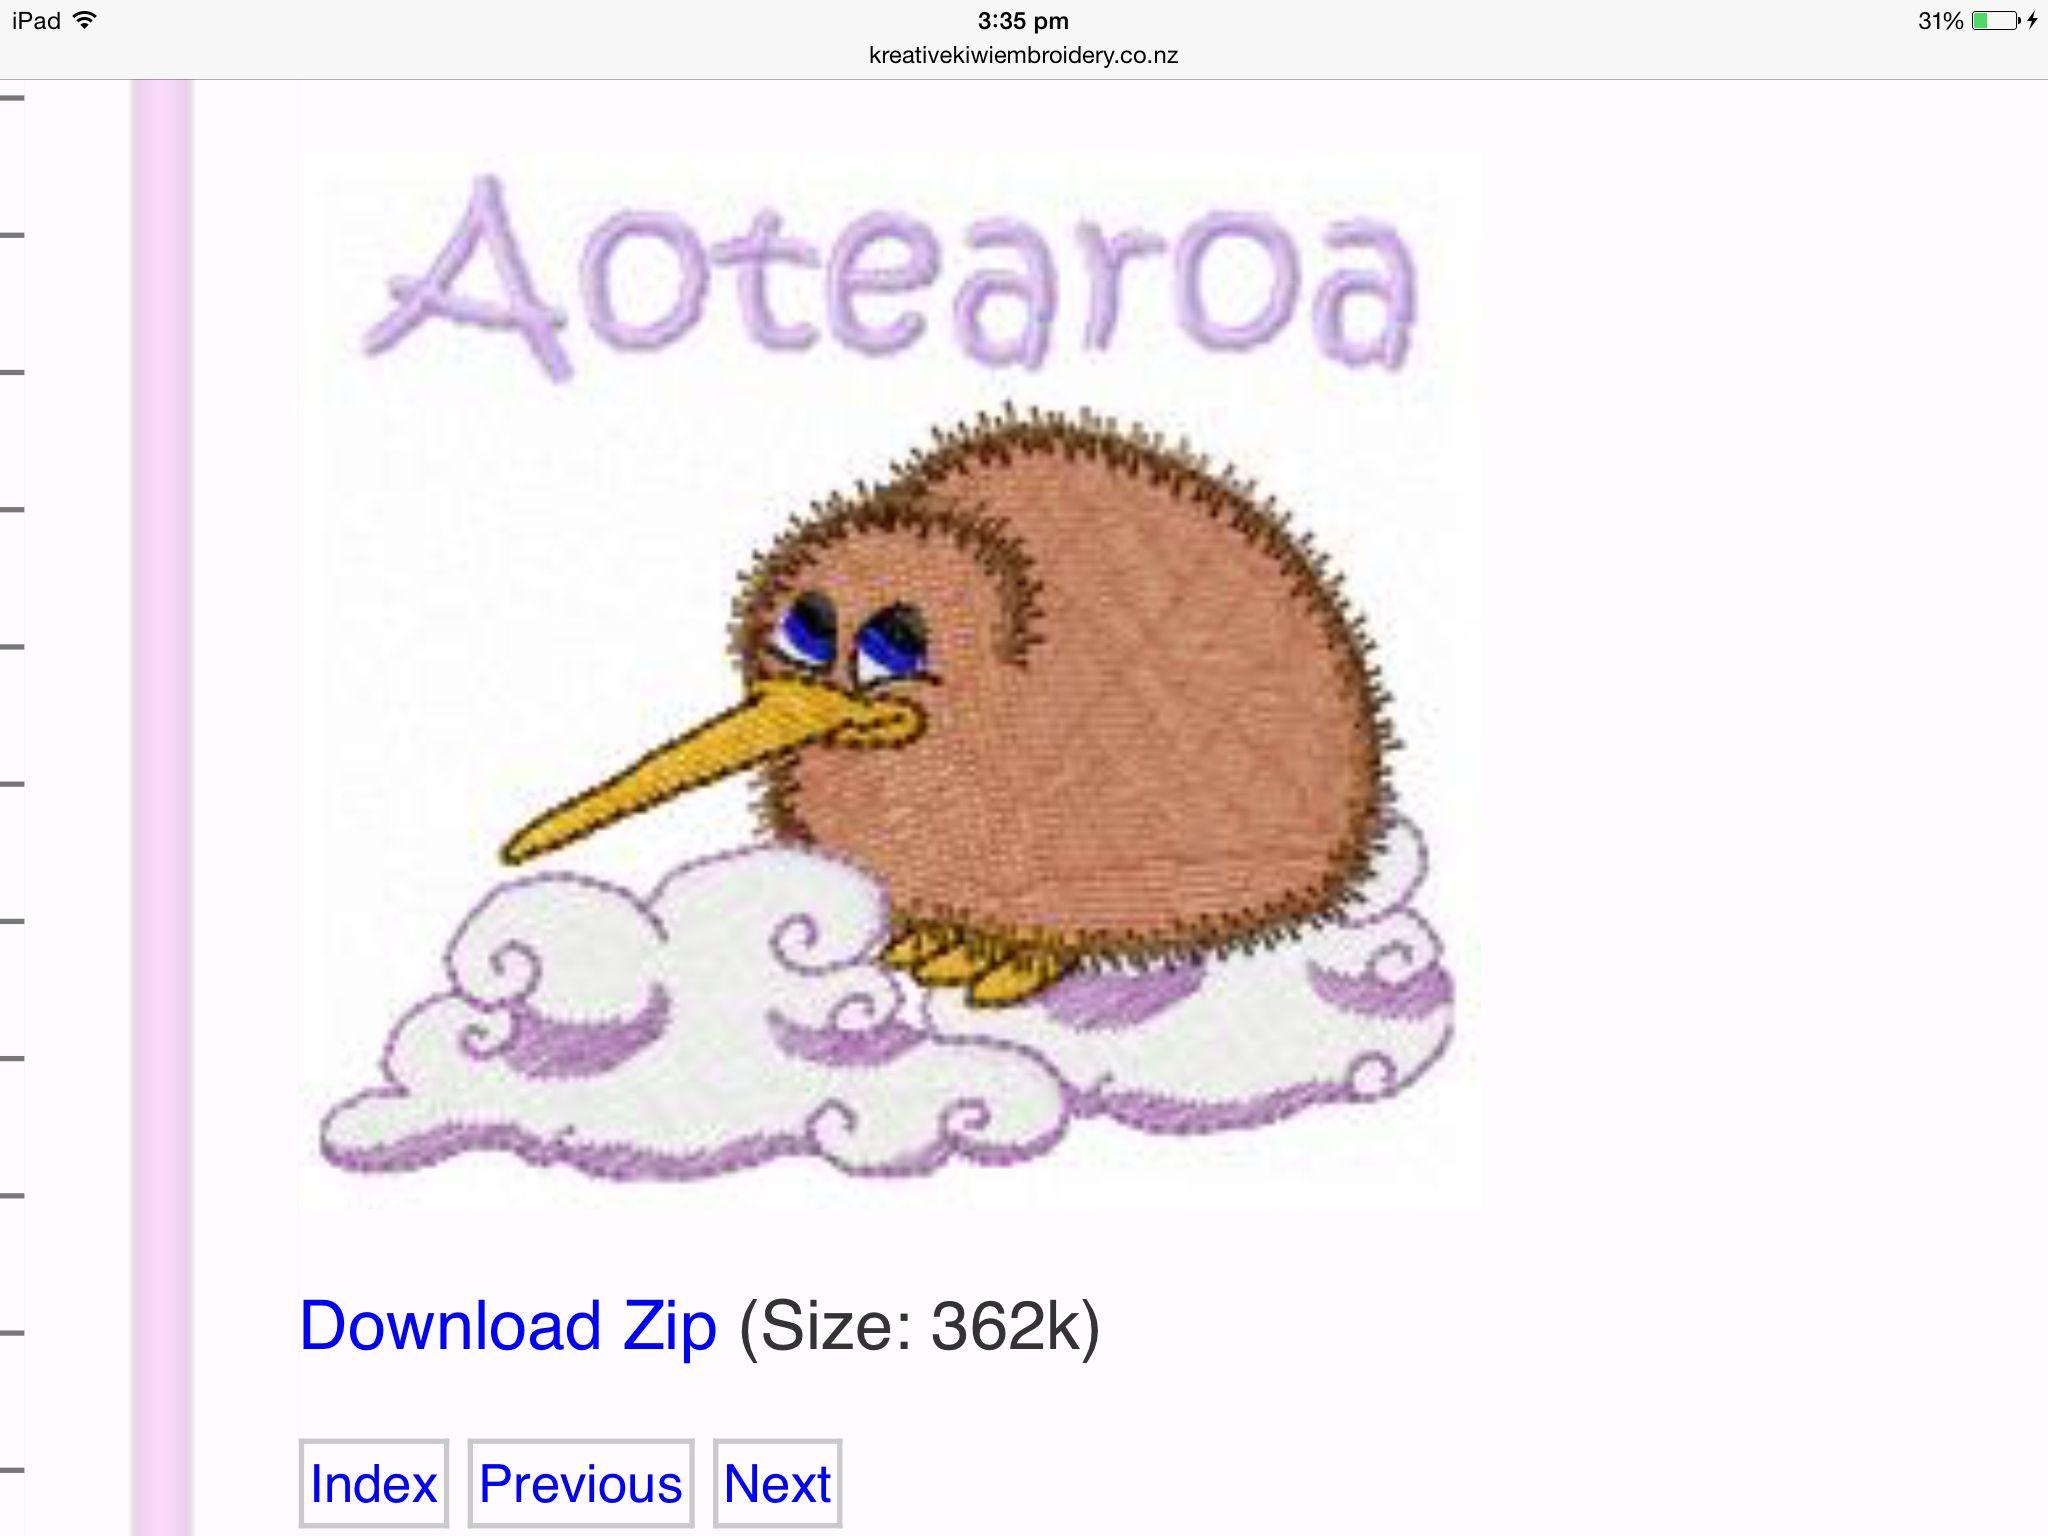 Kreative kiwi kiwi freebie | AUSSIE HERO - Embroidery | Free